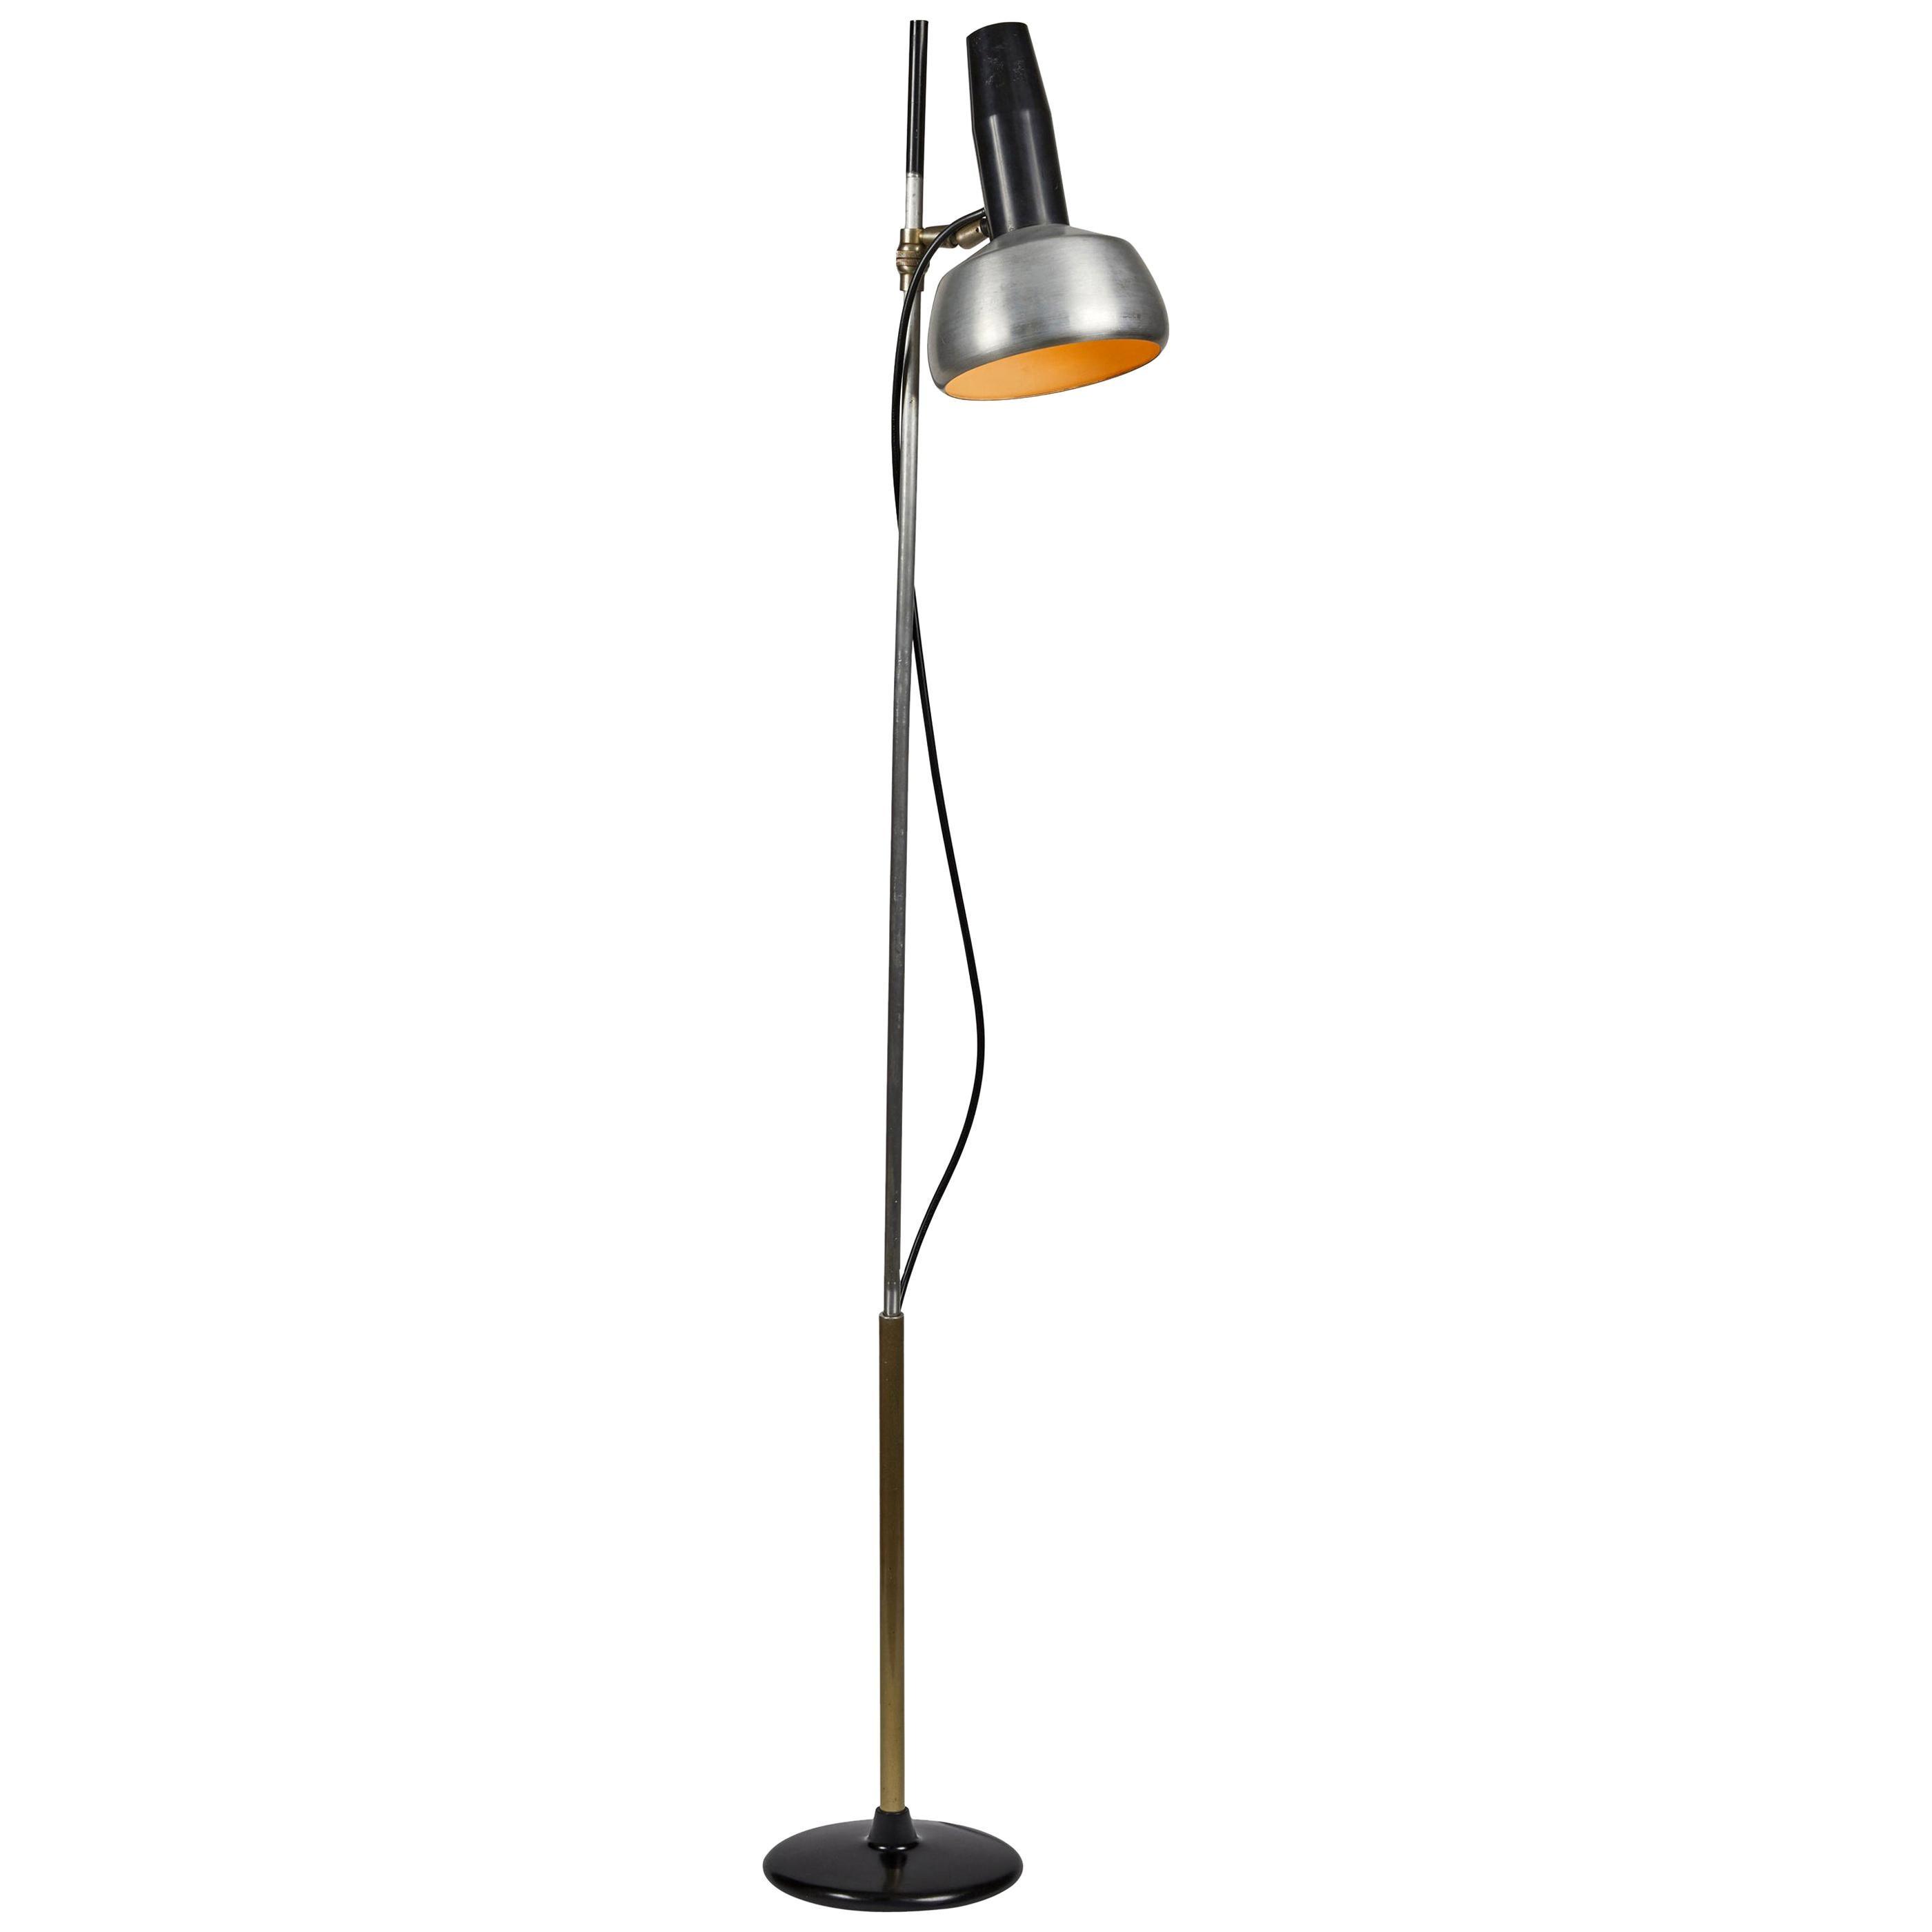 1950s Oscar Torlasco Floor Lamp Model for Lumi